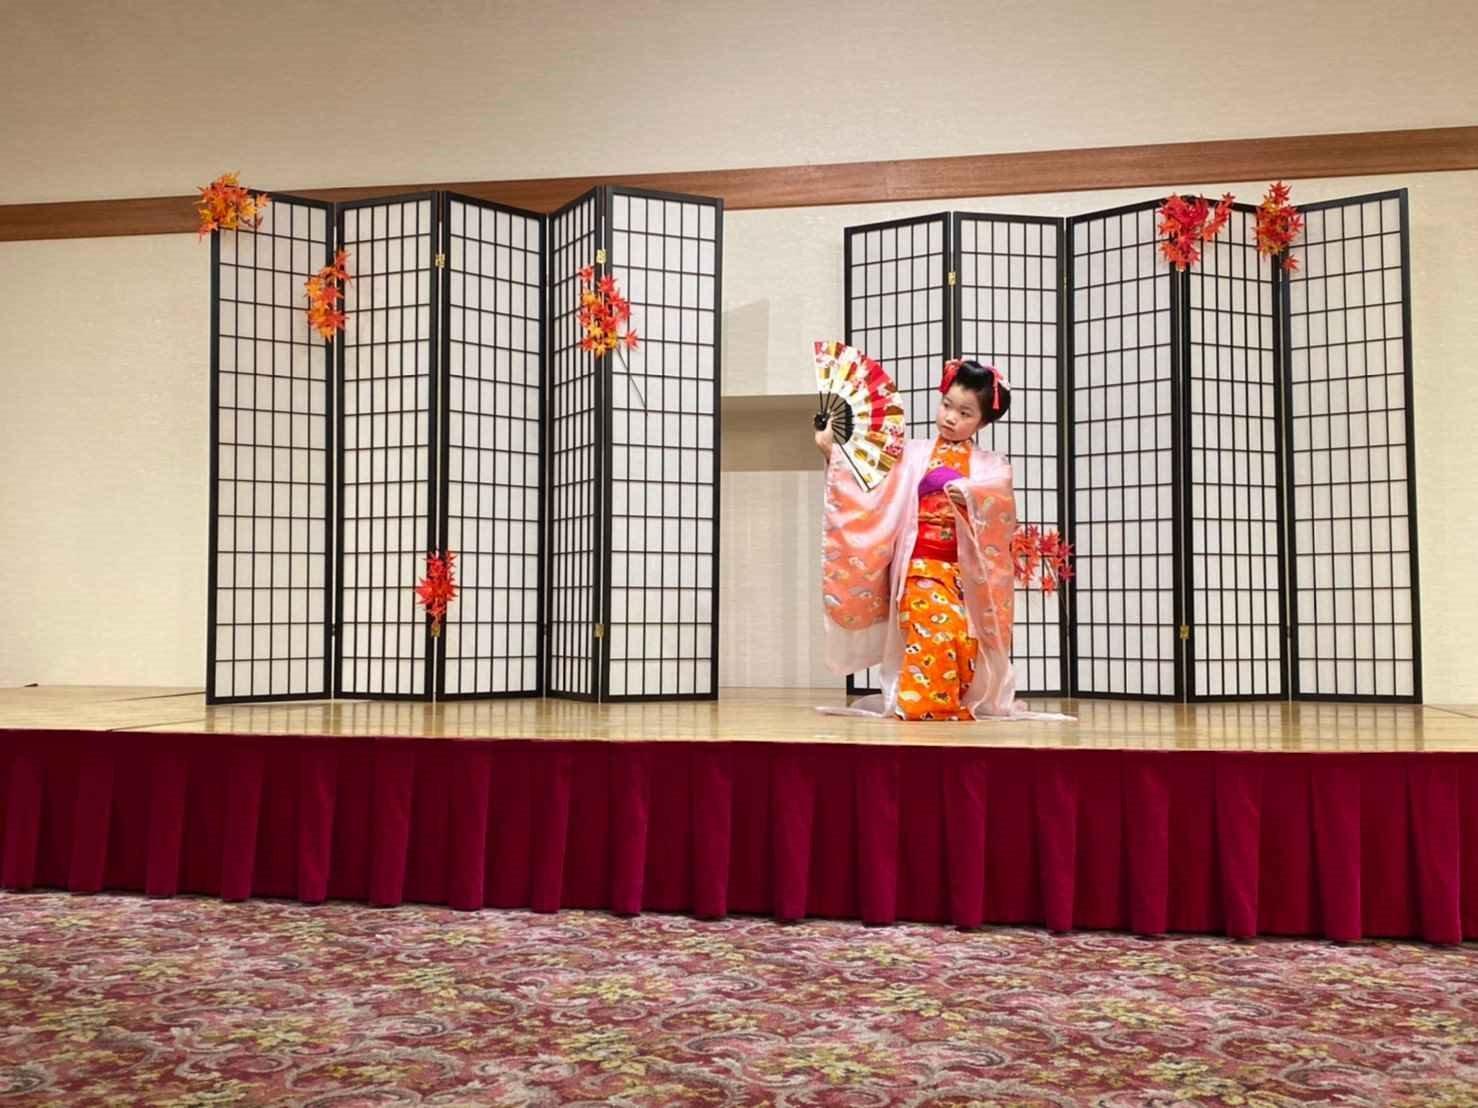 簡単に学べる日本舞踊、新舞踊